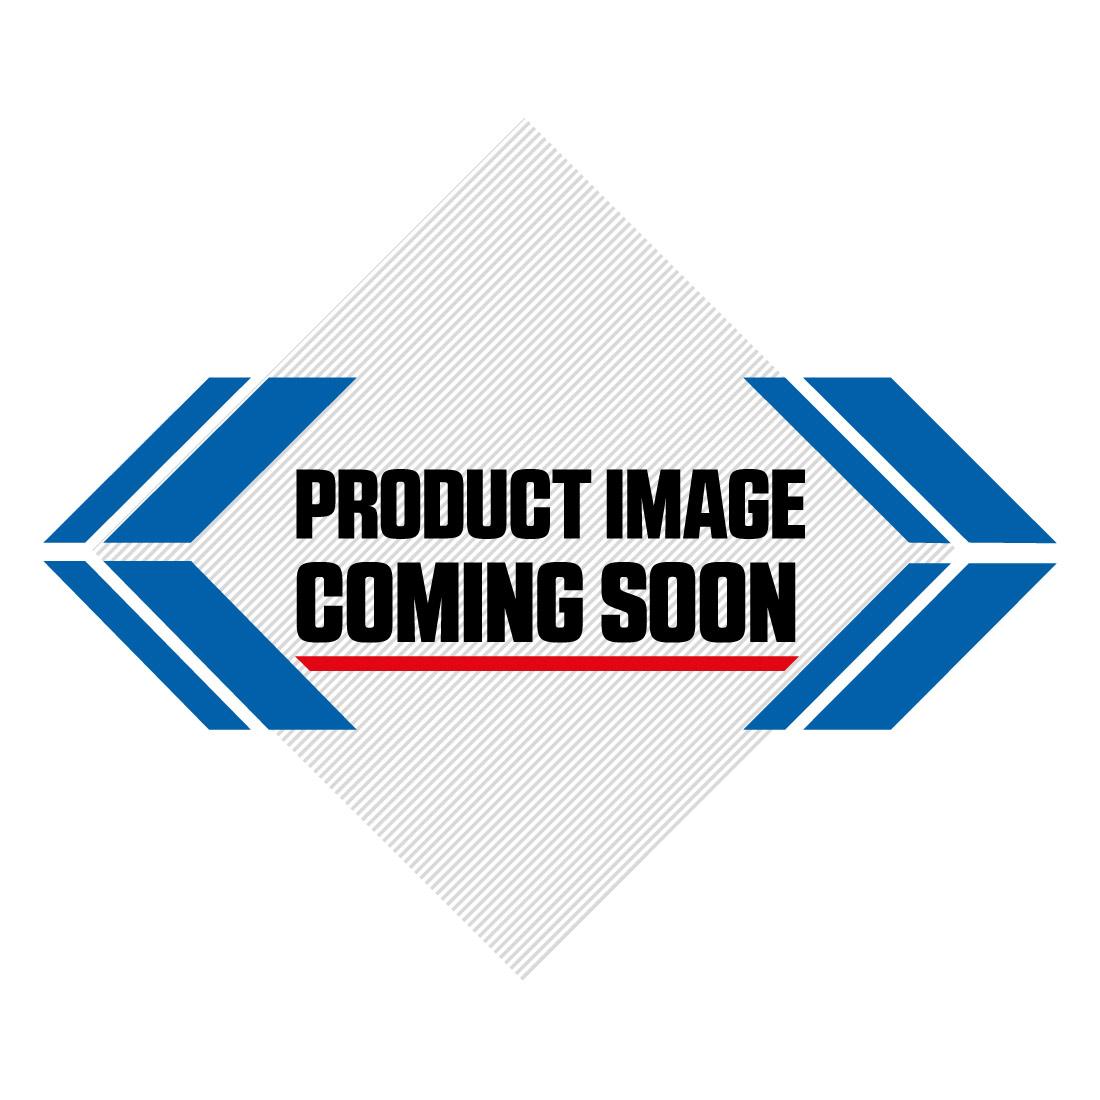 2018 Sidi Crossfire 3 SRS Cairoli Motocross Boots - Ltd Ed Yellow Flo White Image-1